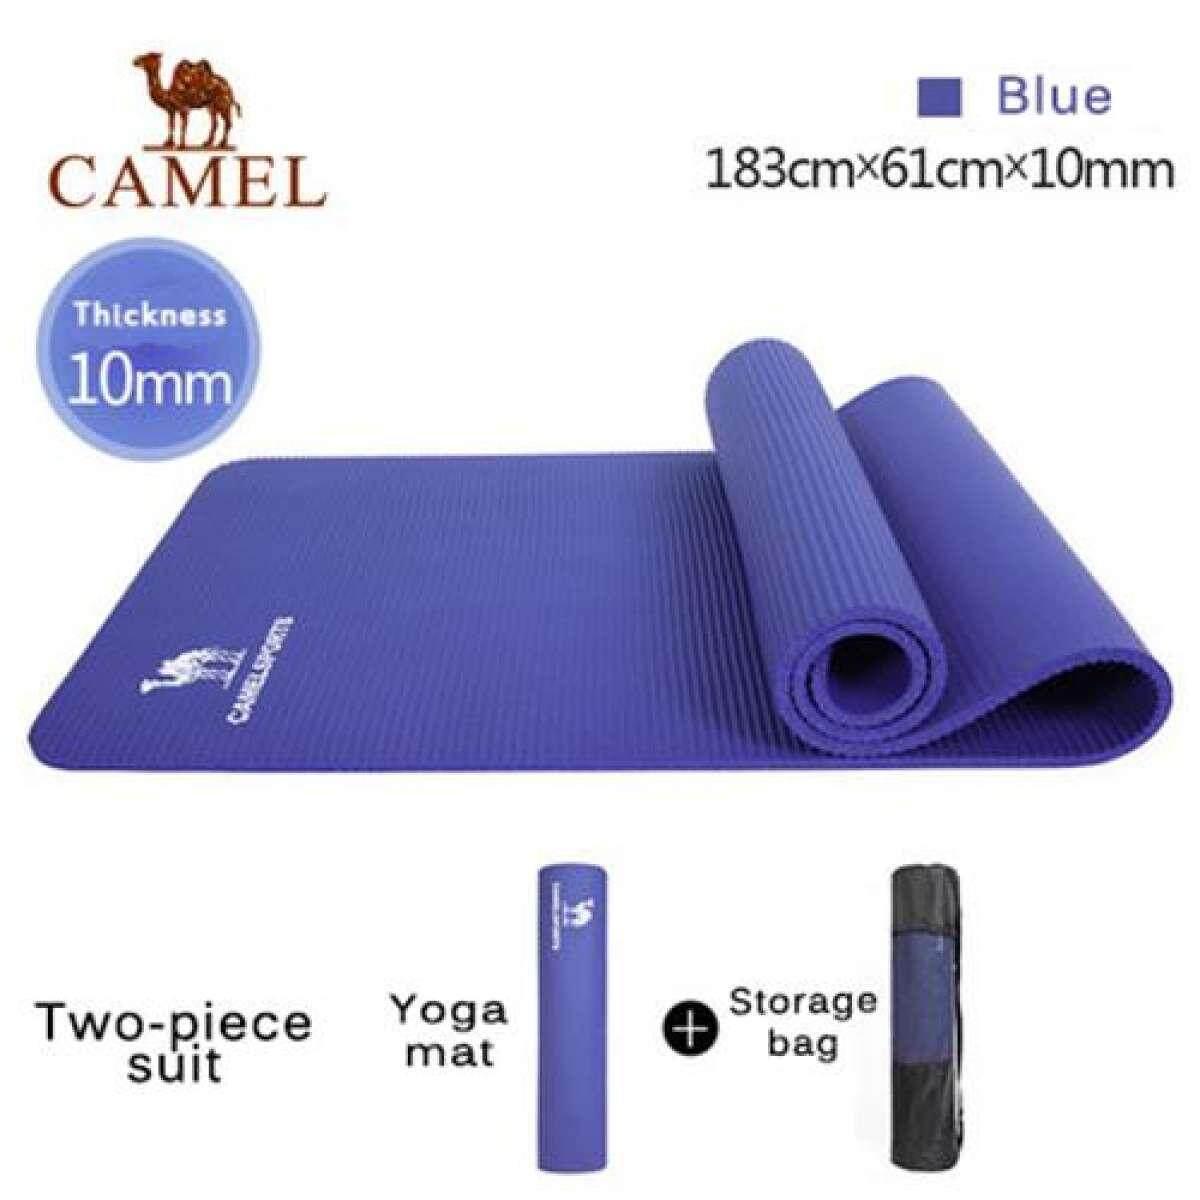 Unta Olahraga Luar Ruangan Berkualitas Tinggi Tikar Yoga Penebalan Non-Slip Fitnessfitness Pilates 183*61*1 Cm Mat Pemula -Intl By Camel International.